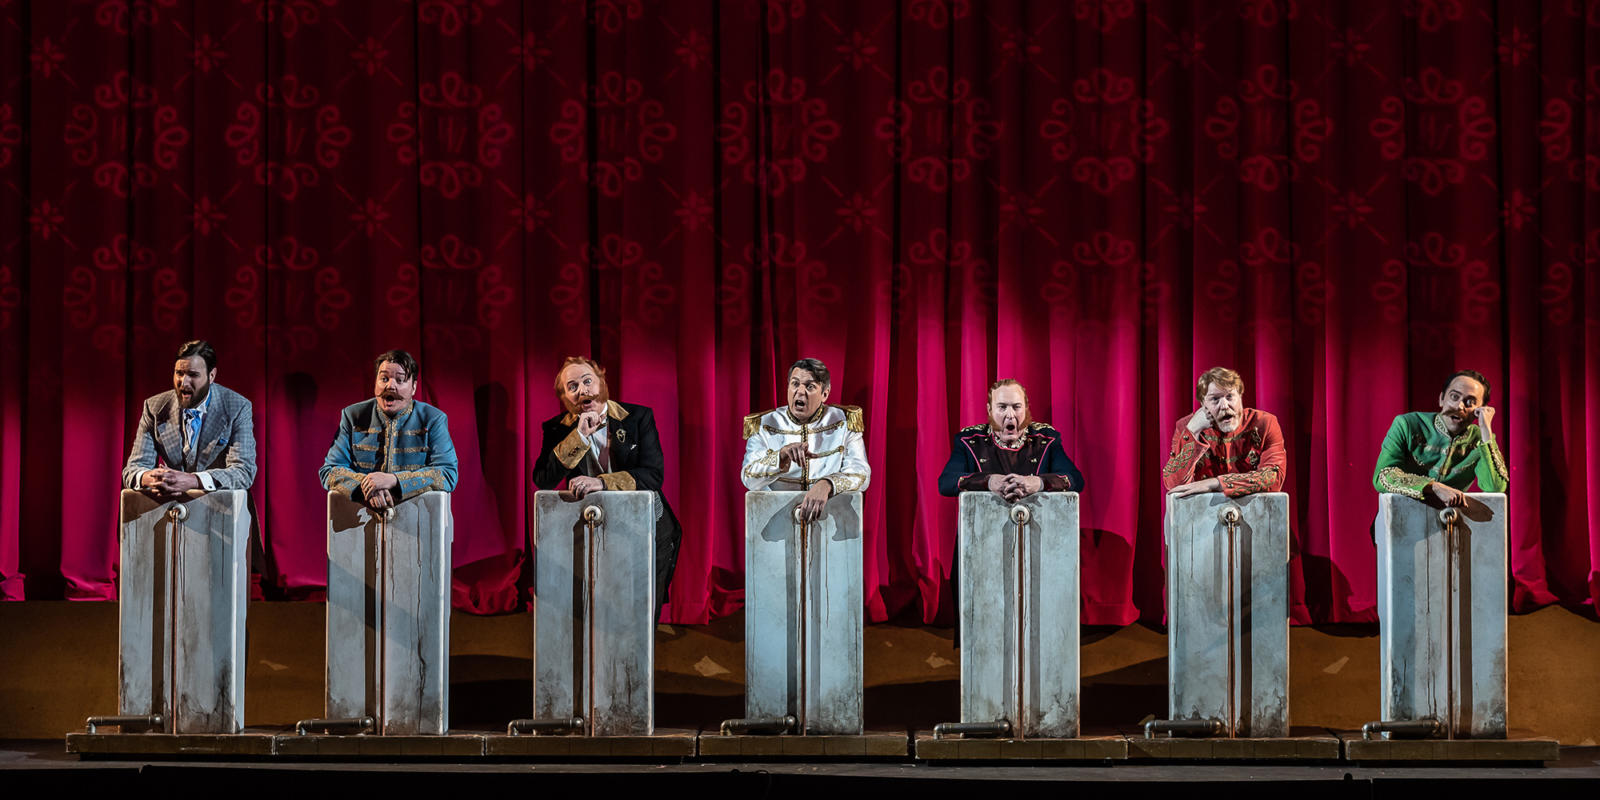 ENO The Merry Widow: (Left to right) Nicholas Lester; Adam Sullivan; Jamie MacDougall; Nathan Gunn; Andrew Shore; Paul Sheehan © Clive Barda